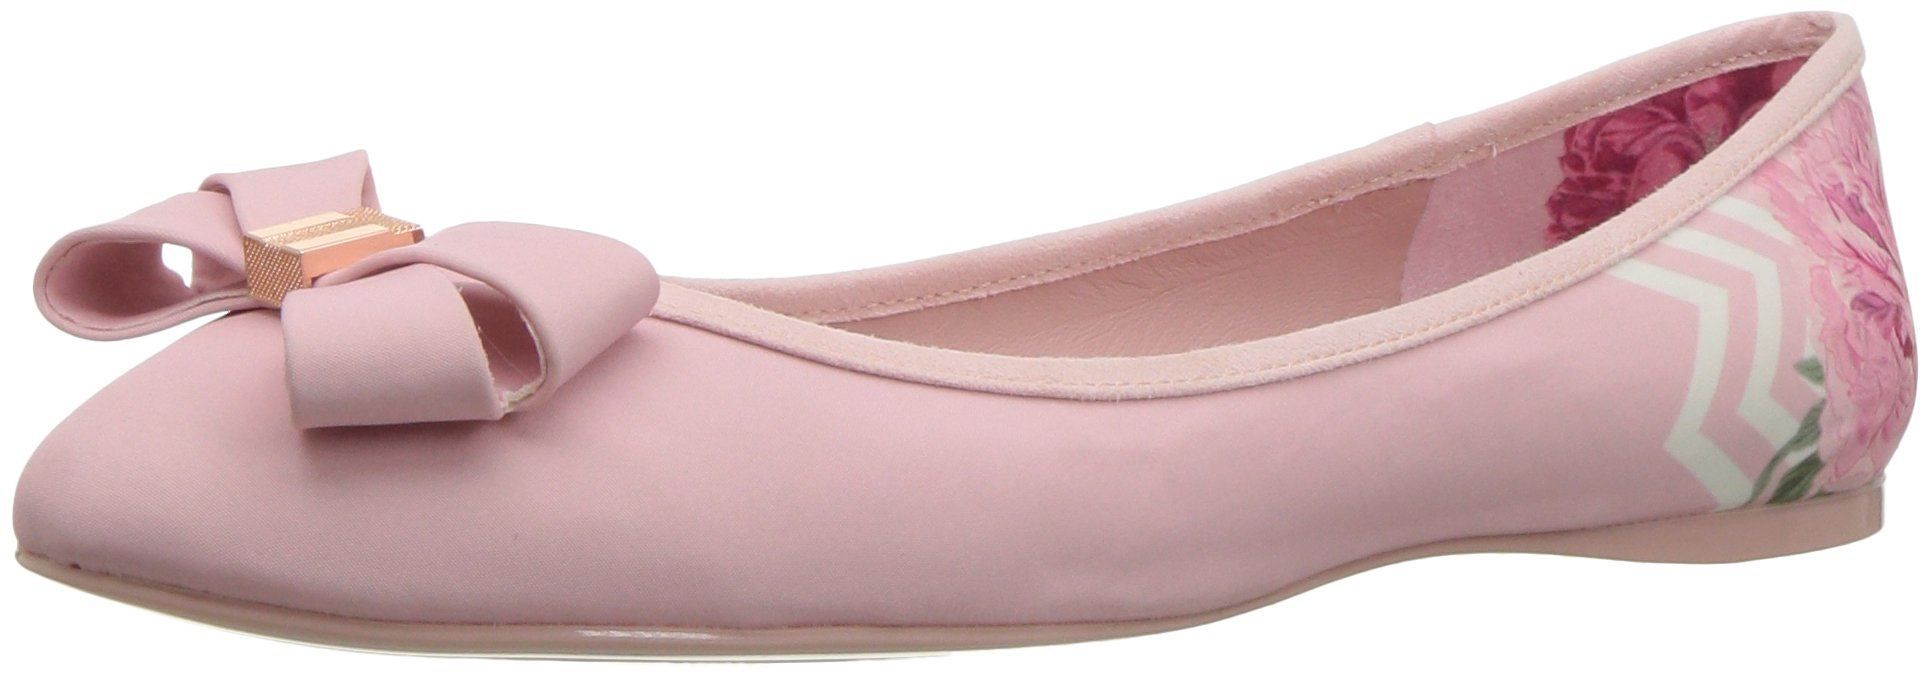 Ted Baker Women's Immet Ballet Shoe, Palace Gardens Textile, 7.5 B(M) US